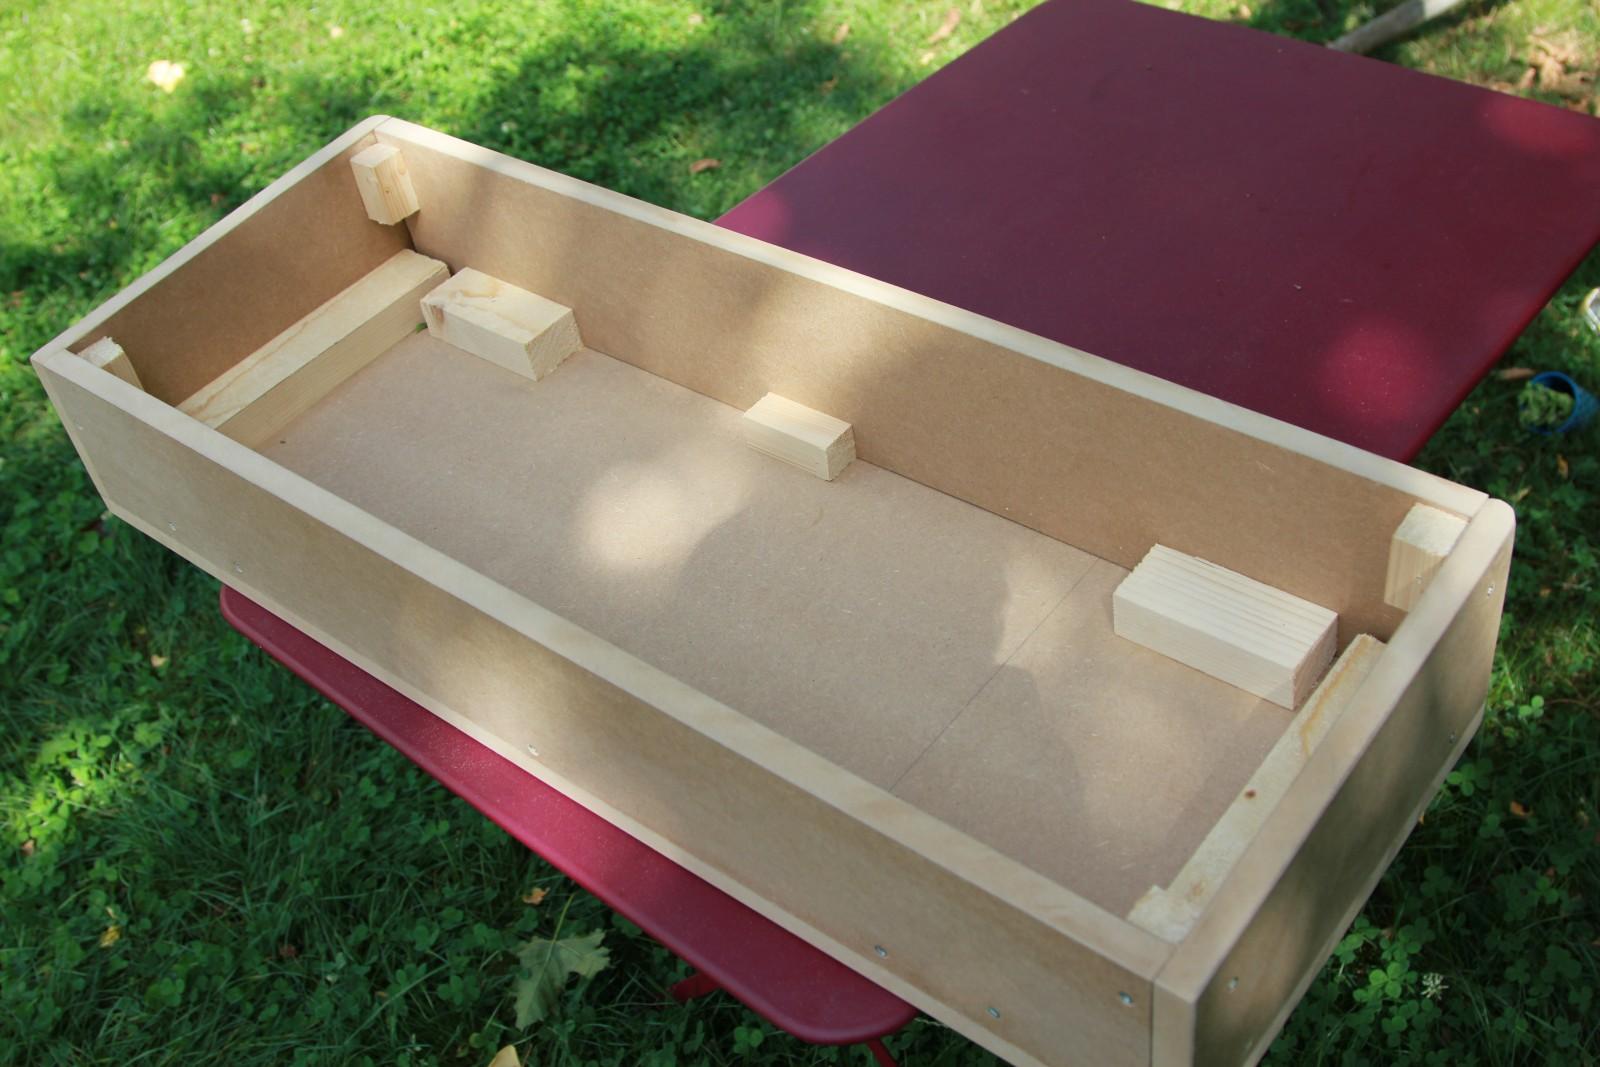 Fabrication du panneau de commande control panel arcade diy - Fabriquer un tiroir en contreplaque ...